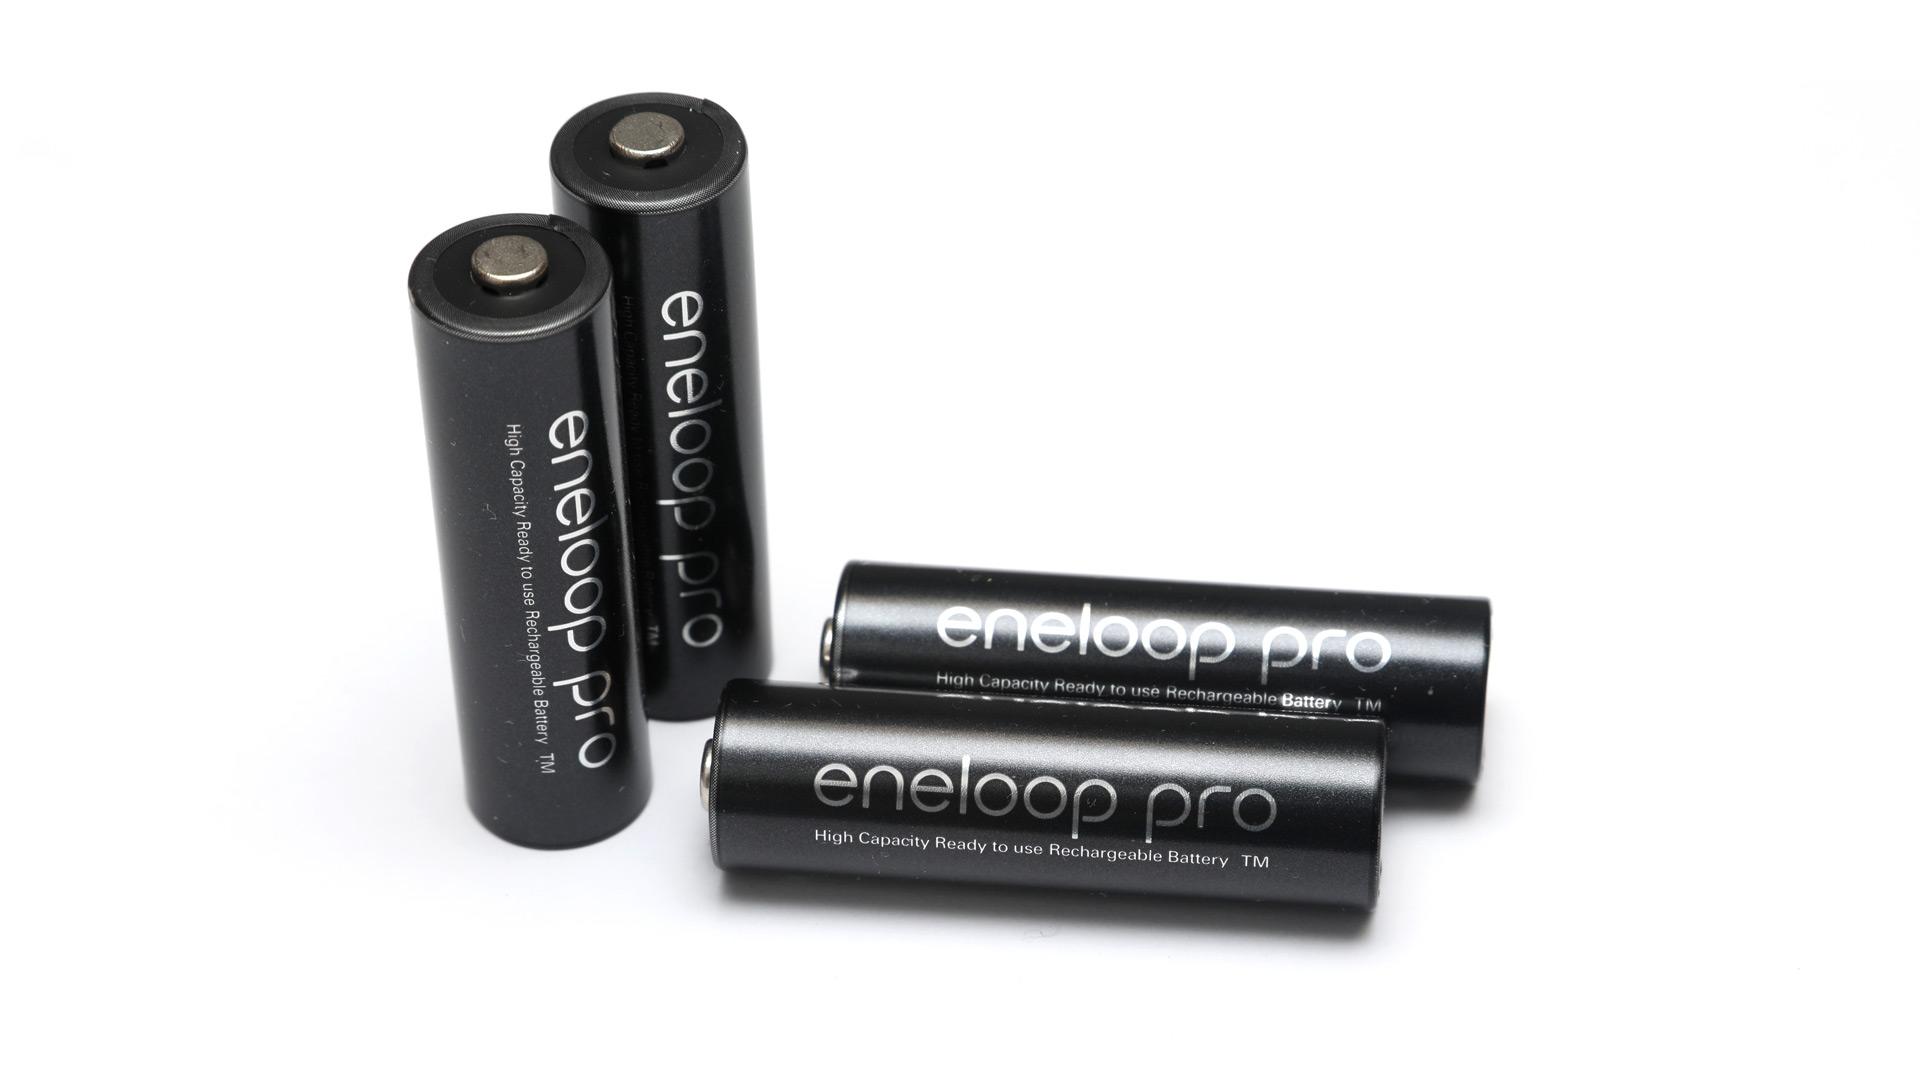 Eneloop Pro AA NiMH 2550mAh Min. 2450mAh Rechargeable Battery Pack of 2